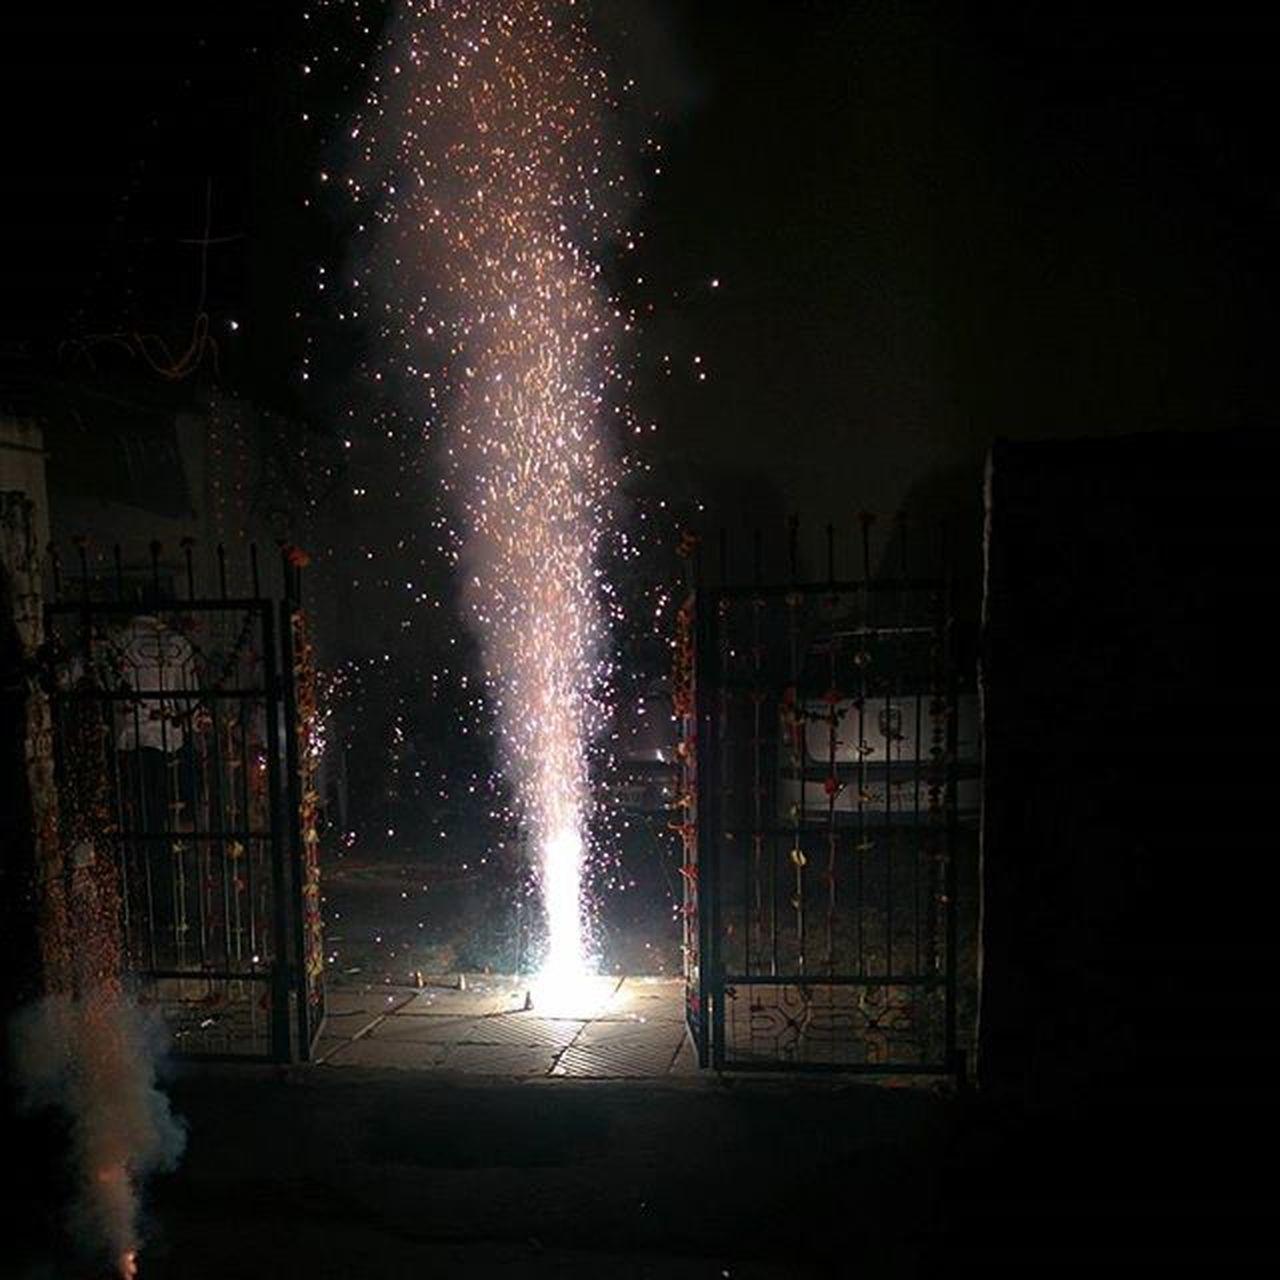 Diwali Anaar Nodamfilter Nexus5 😘 India Festival Anaar Colours Fireworks